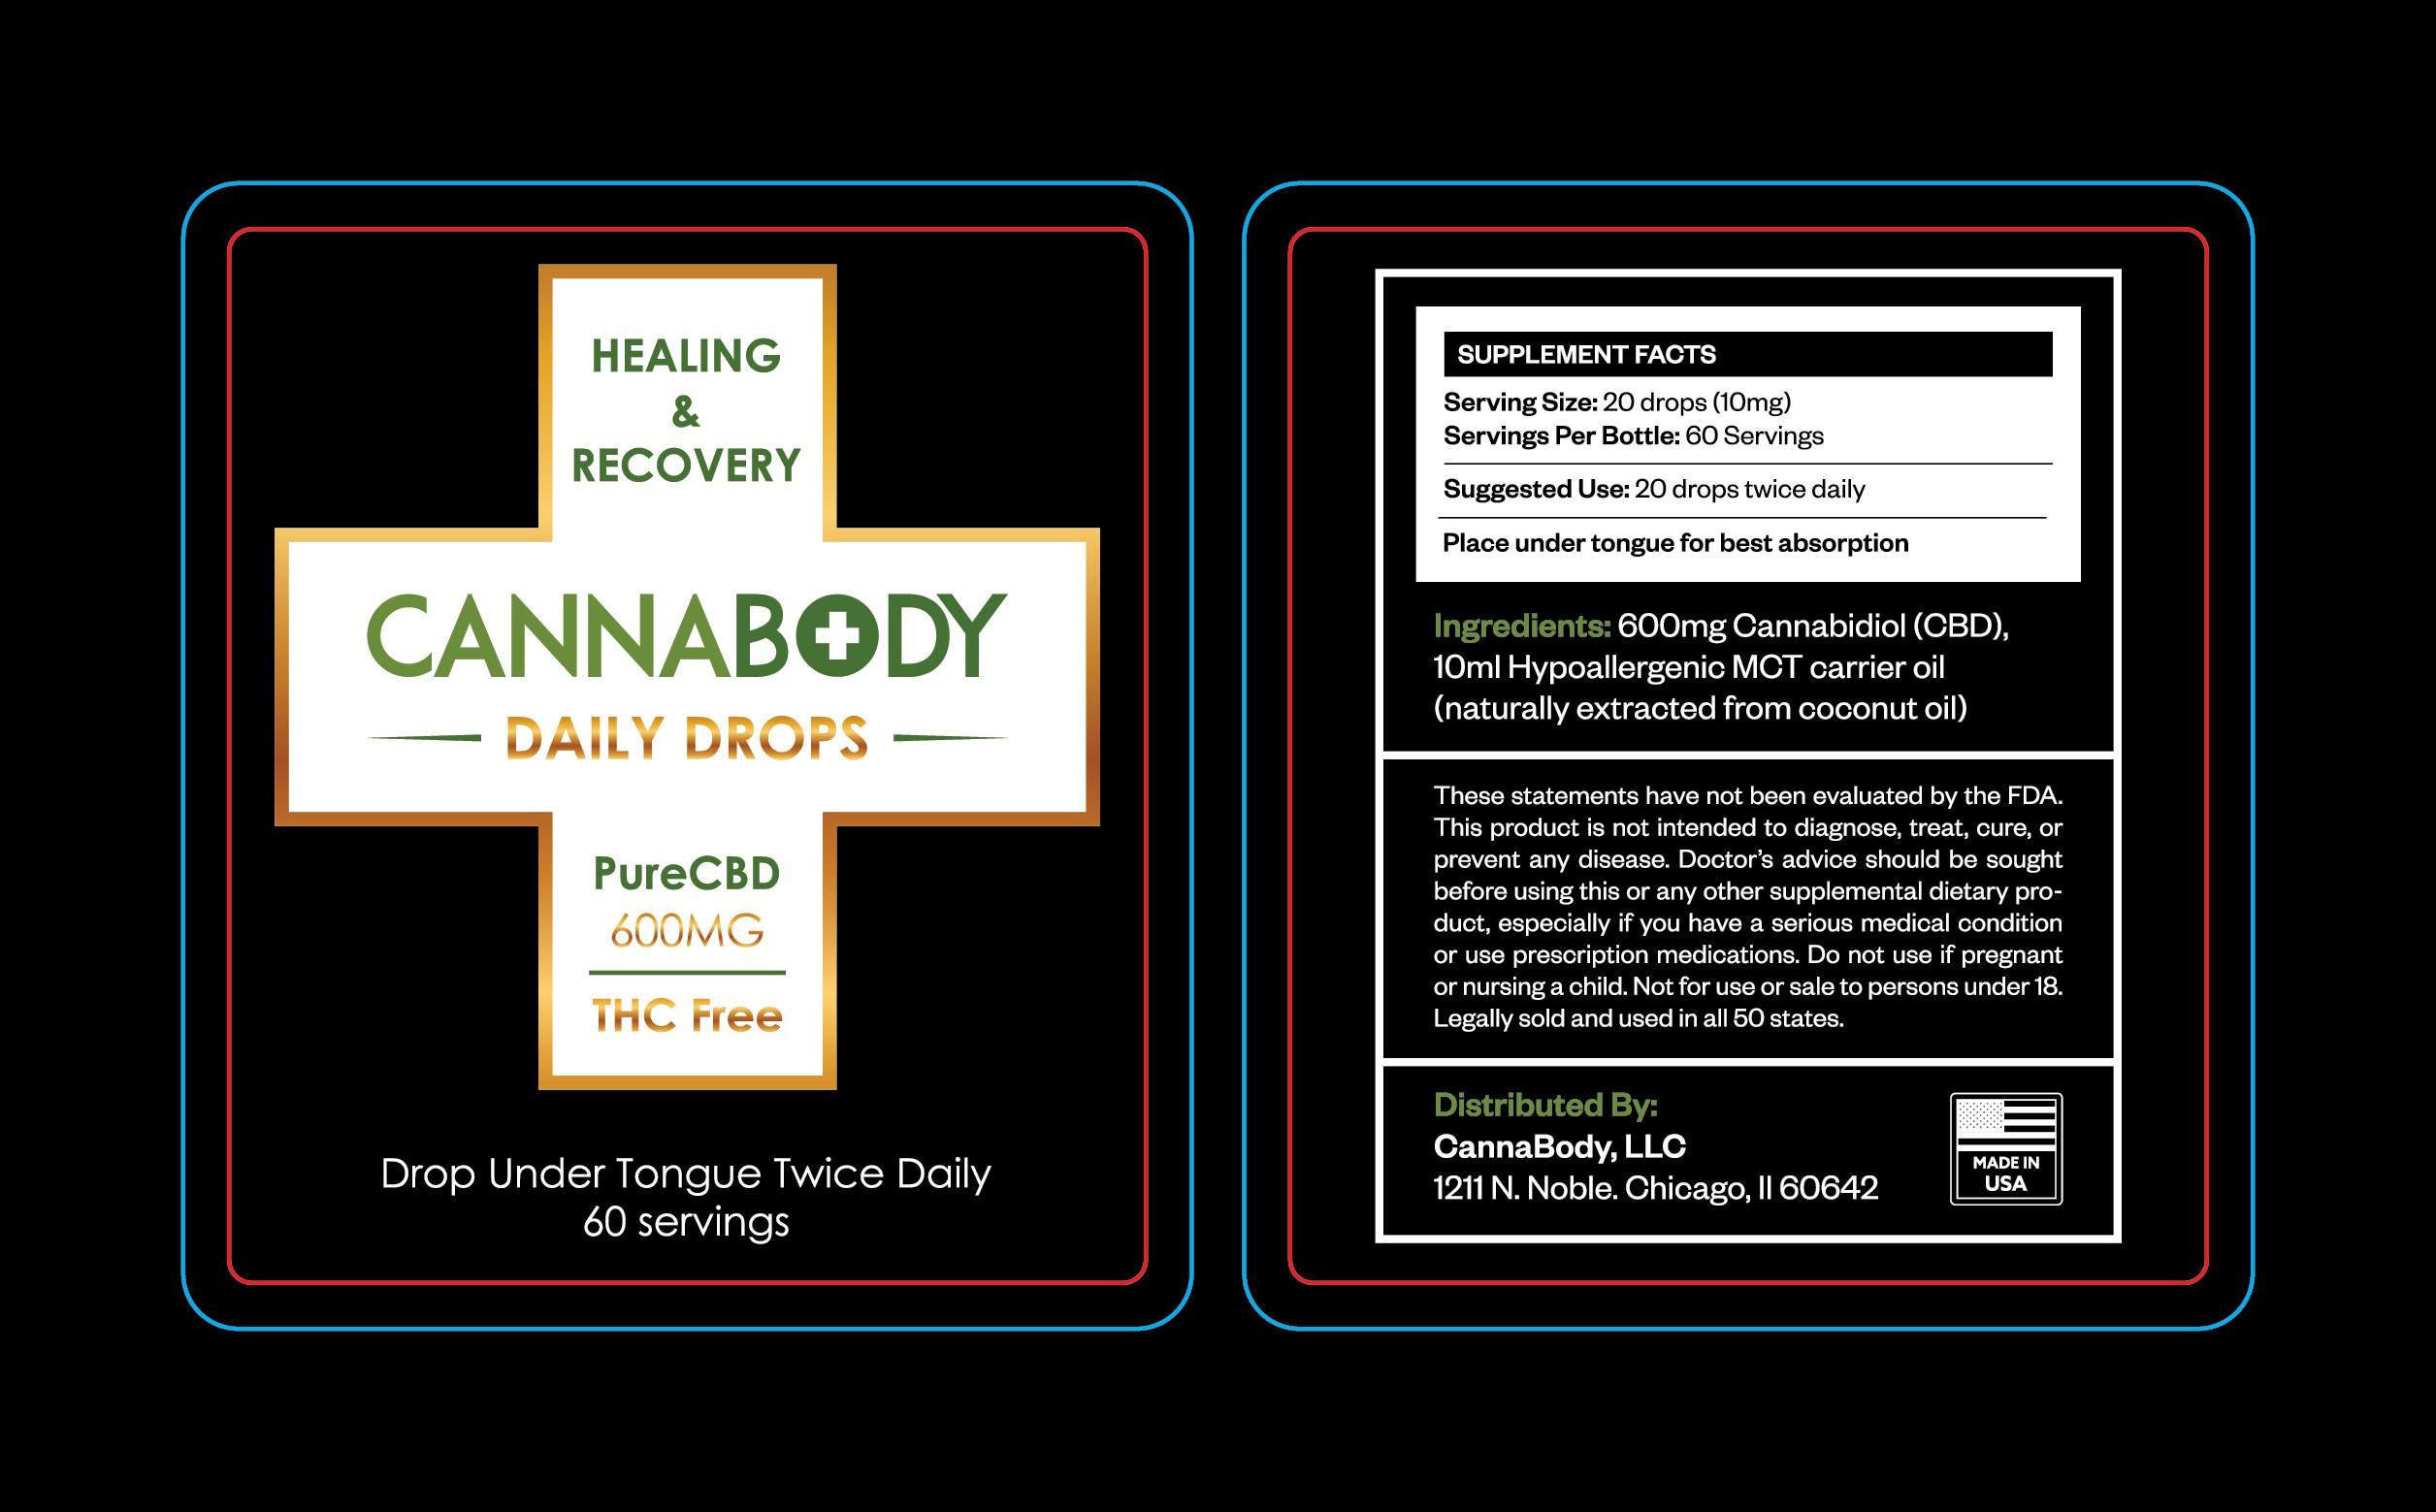 CannaBody CBD Oil Label Design Contest